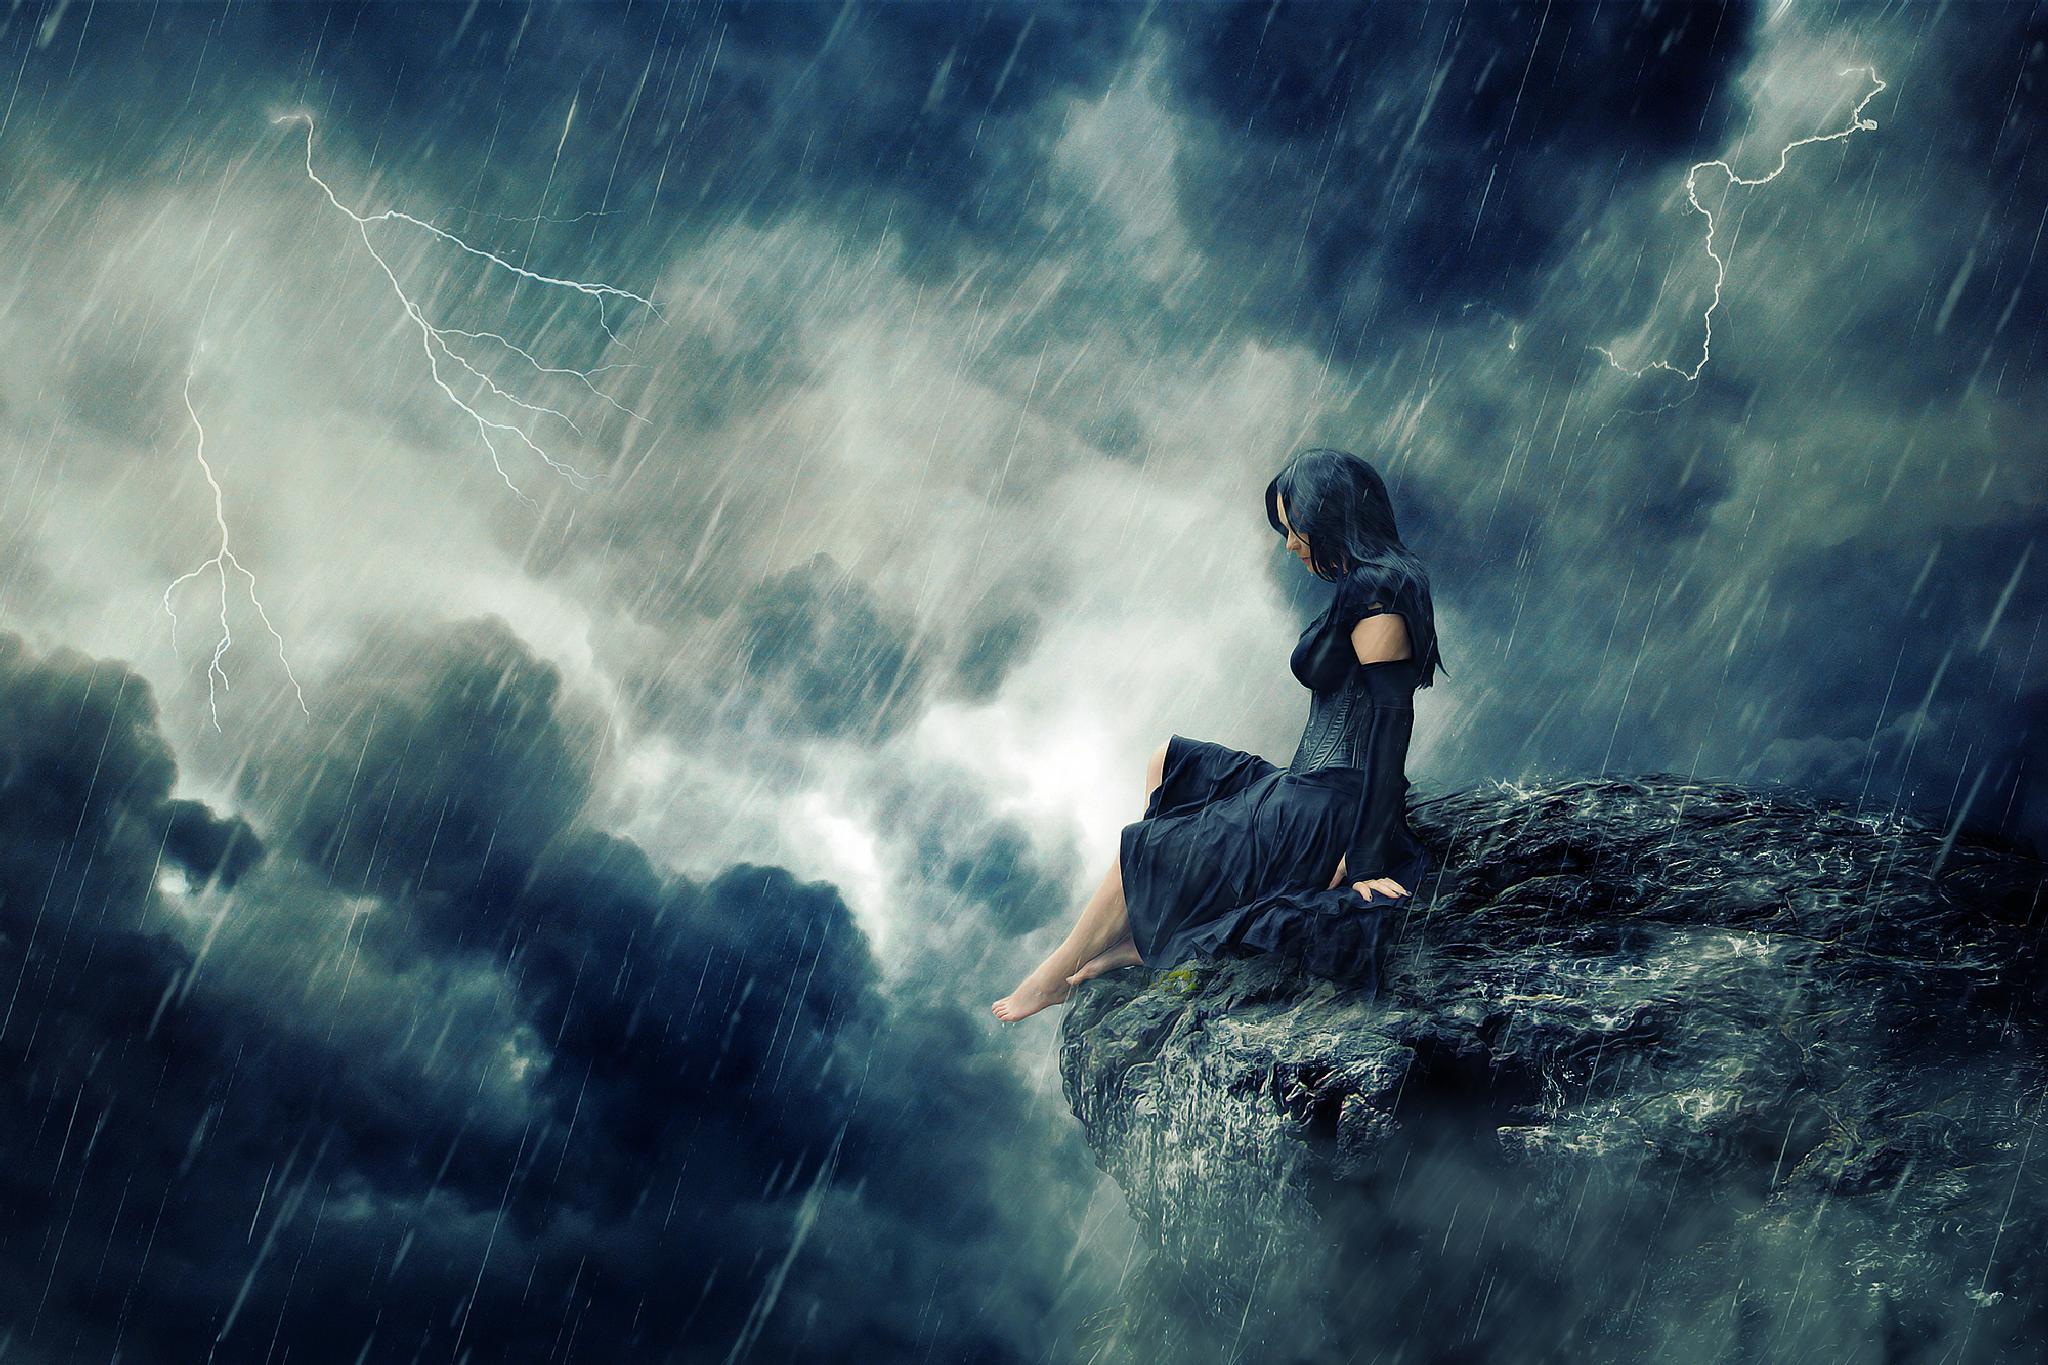 Sadness by Stefan Braas